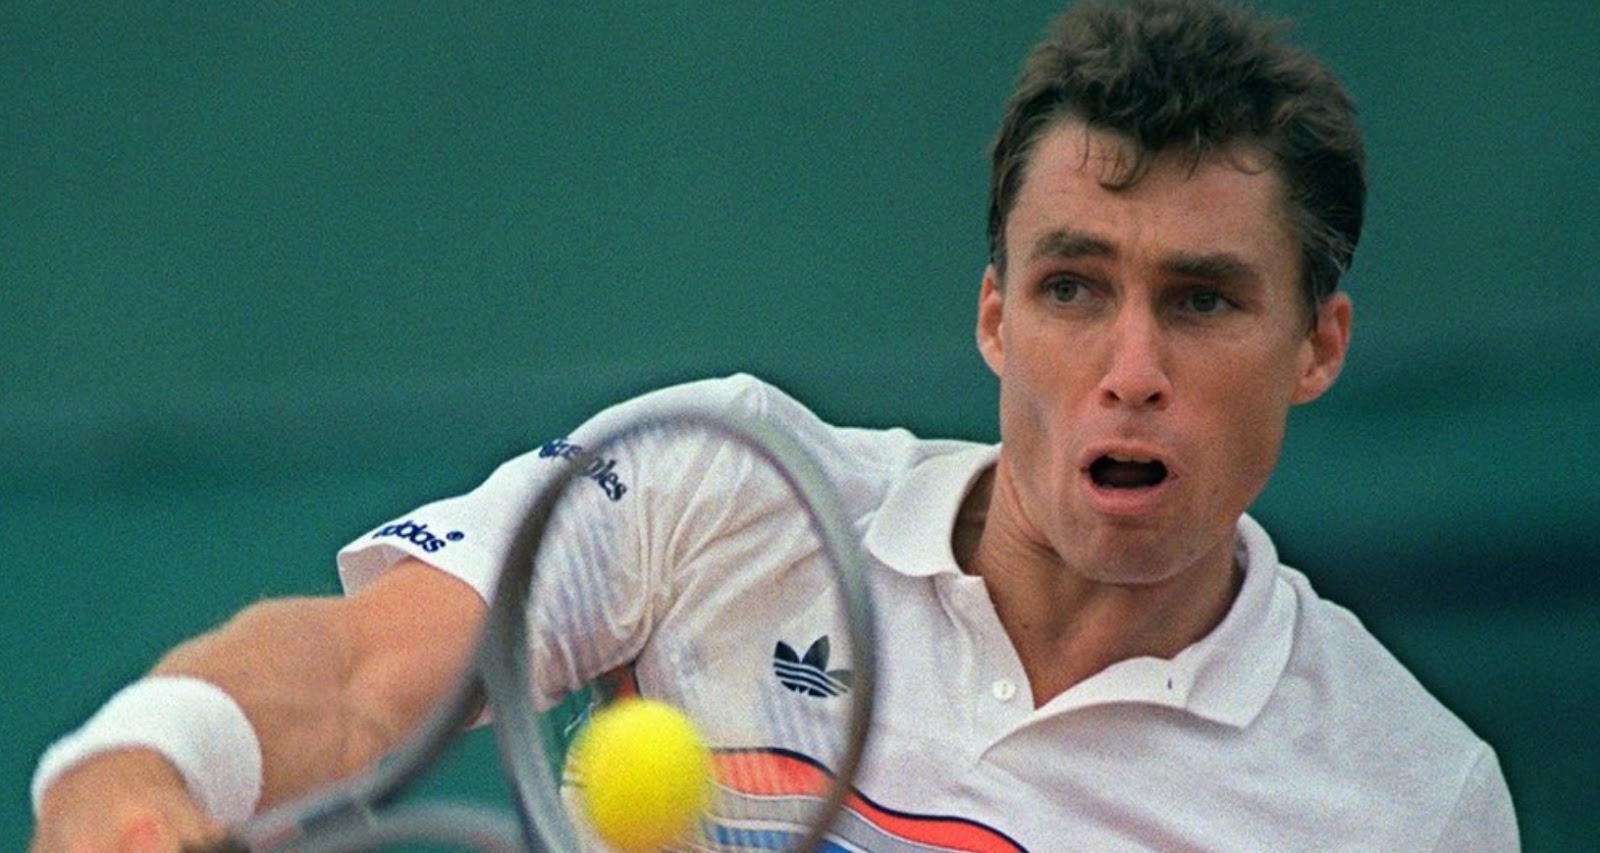 Ivan lendl won ATP Tour finals 5 times